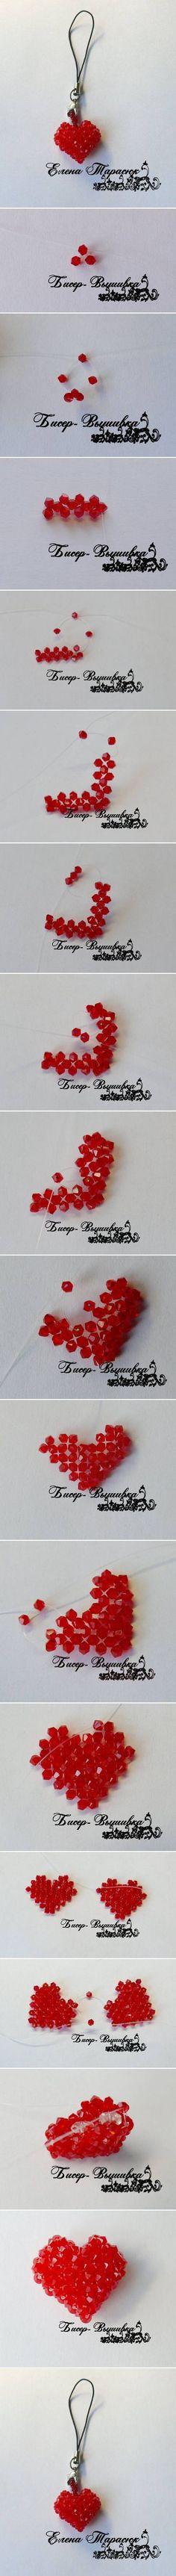 DIY Beads Heart Ornament DIY Projects / UsefulDIY.com